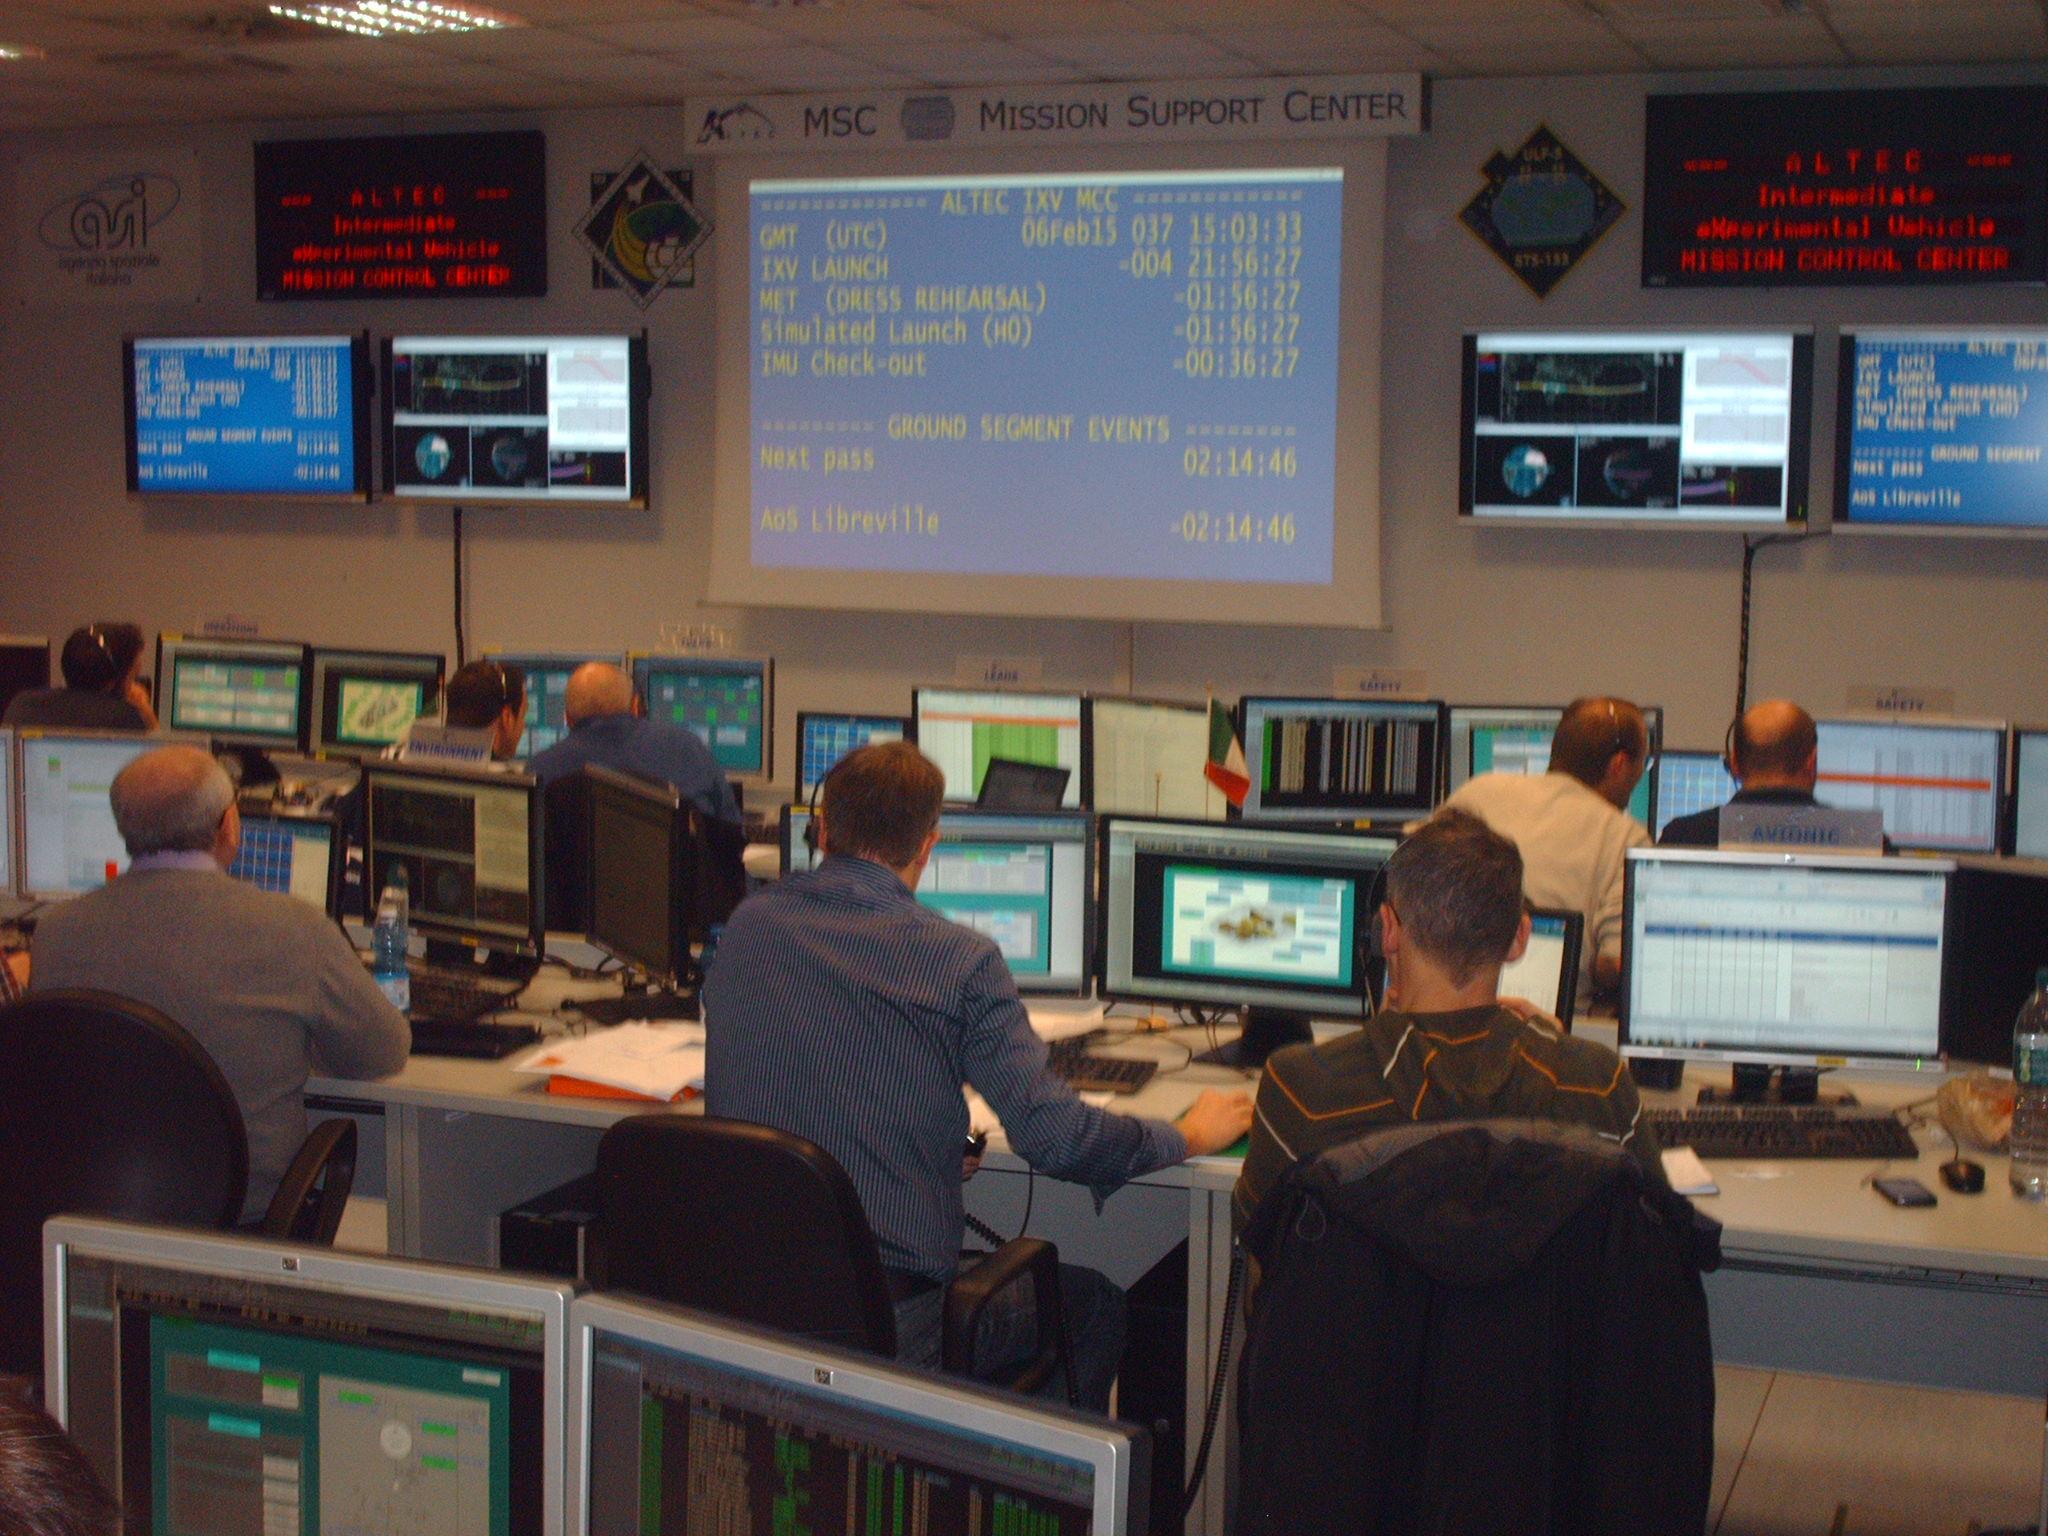 IXV simulation at MCC Altec Turin 6 Feb Credit: ESA